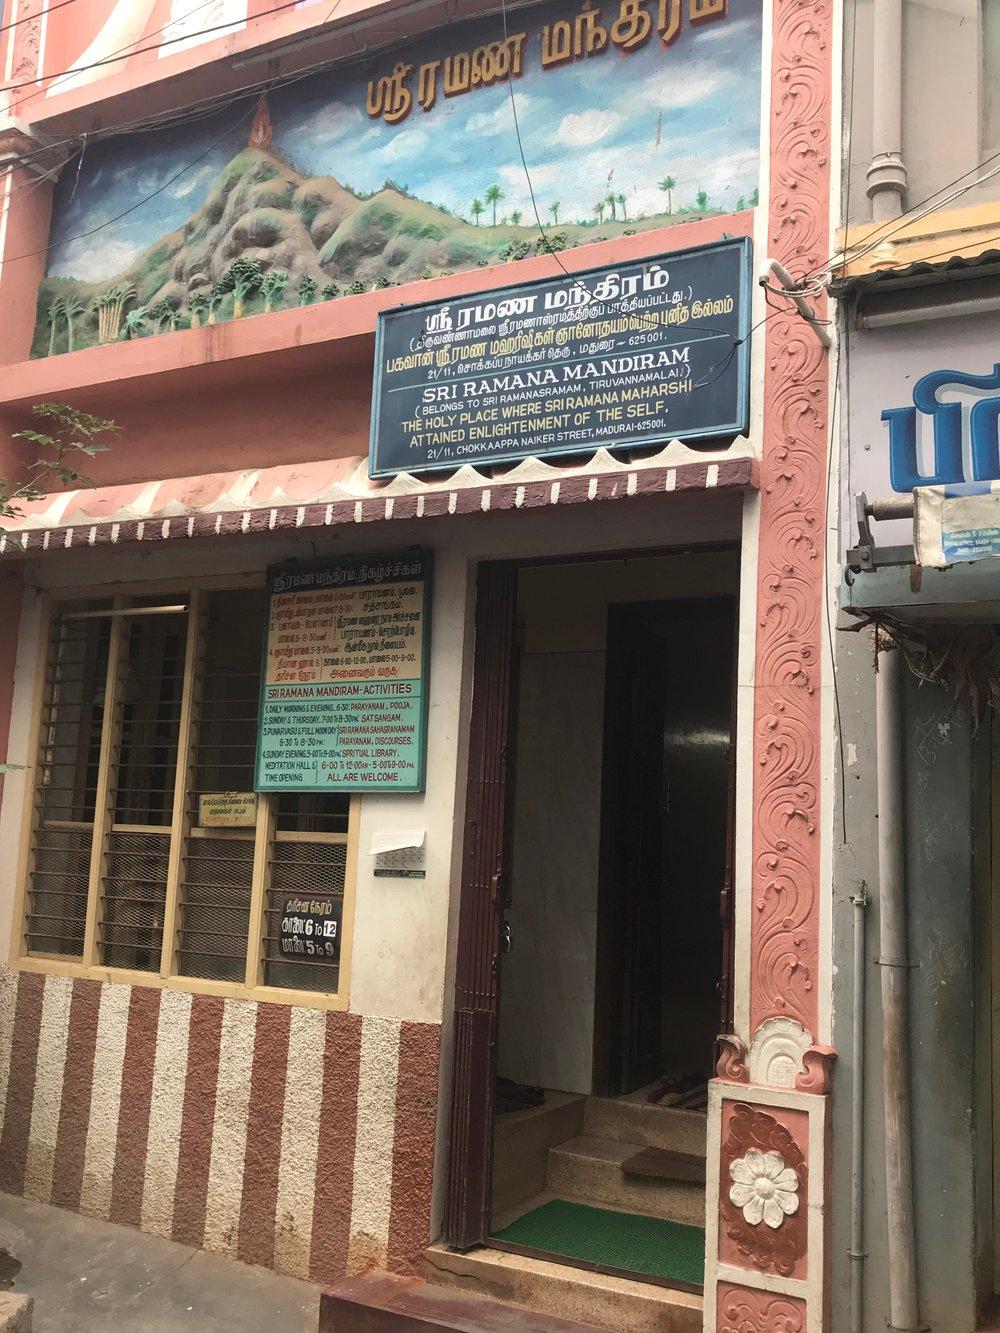 Sri Ramana Mandiram's Enlightenment place where I meditated for a bit